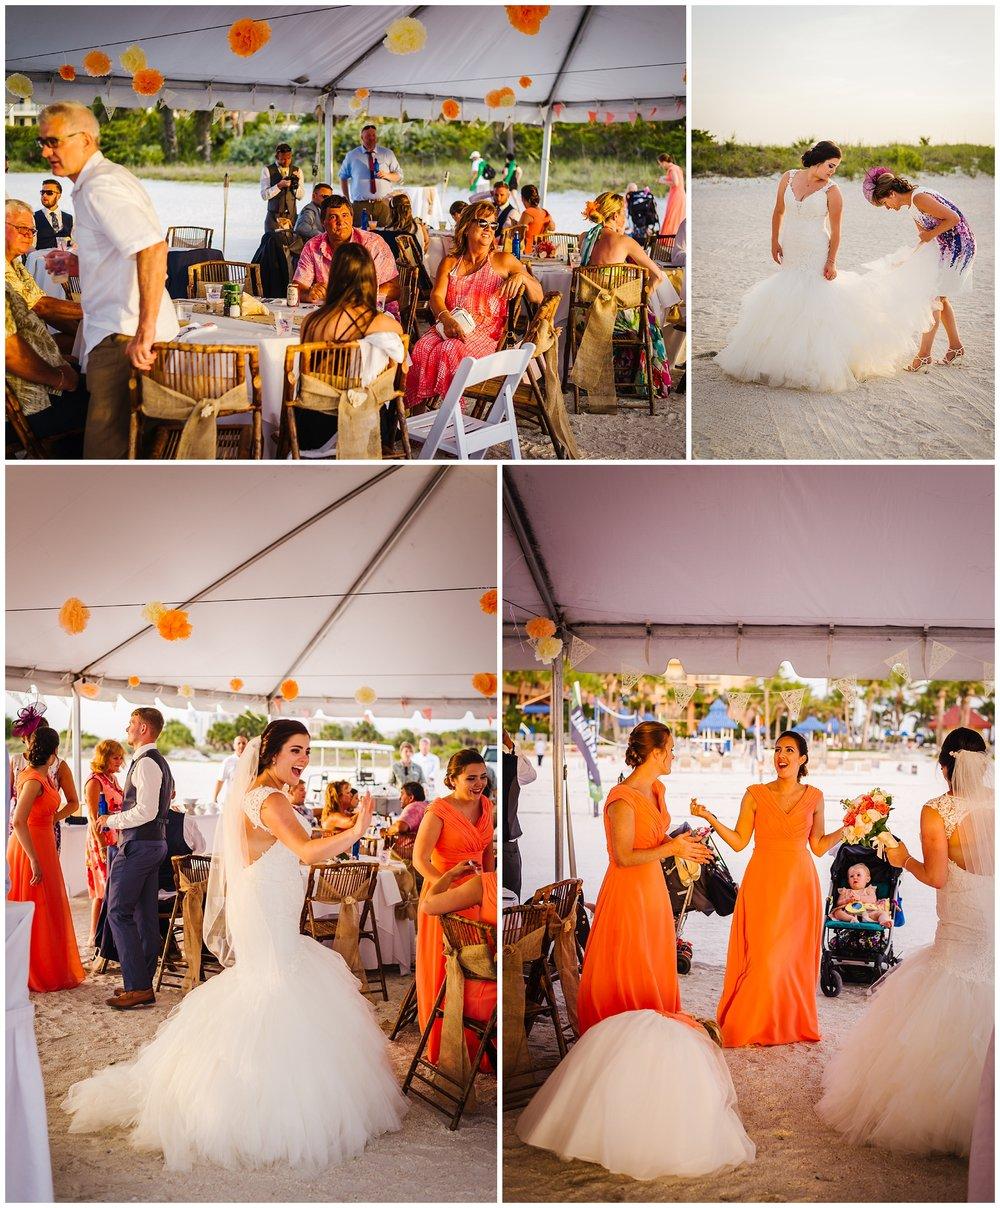 Clearwater-destination-wedding-photographer-jimmy-choo-yves-st-laurent-sunset_0104.jpg